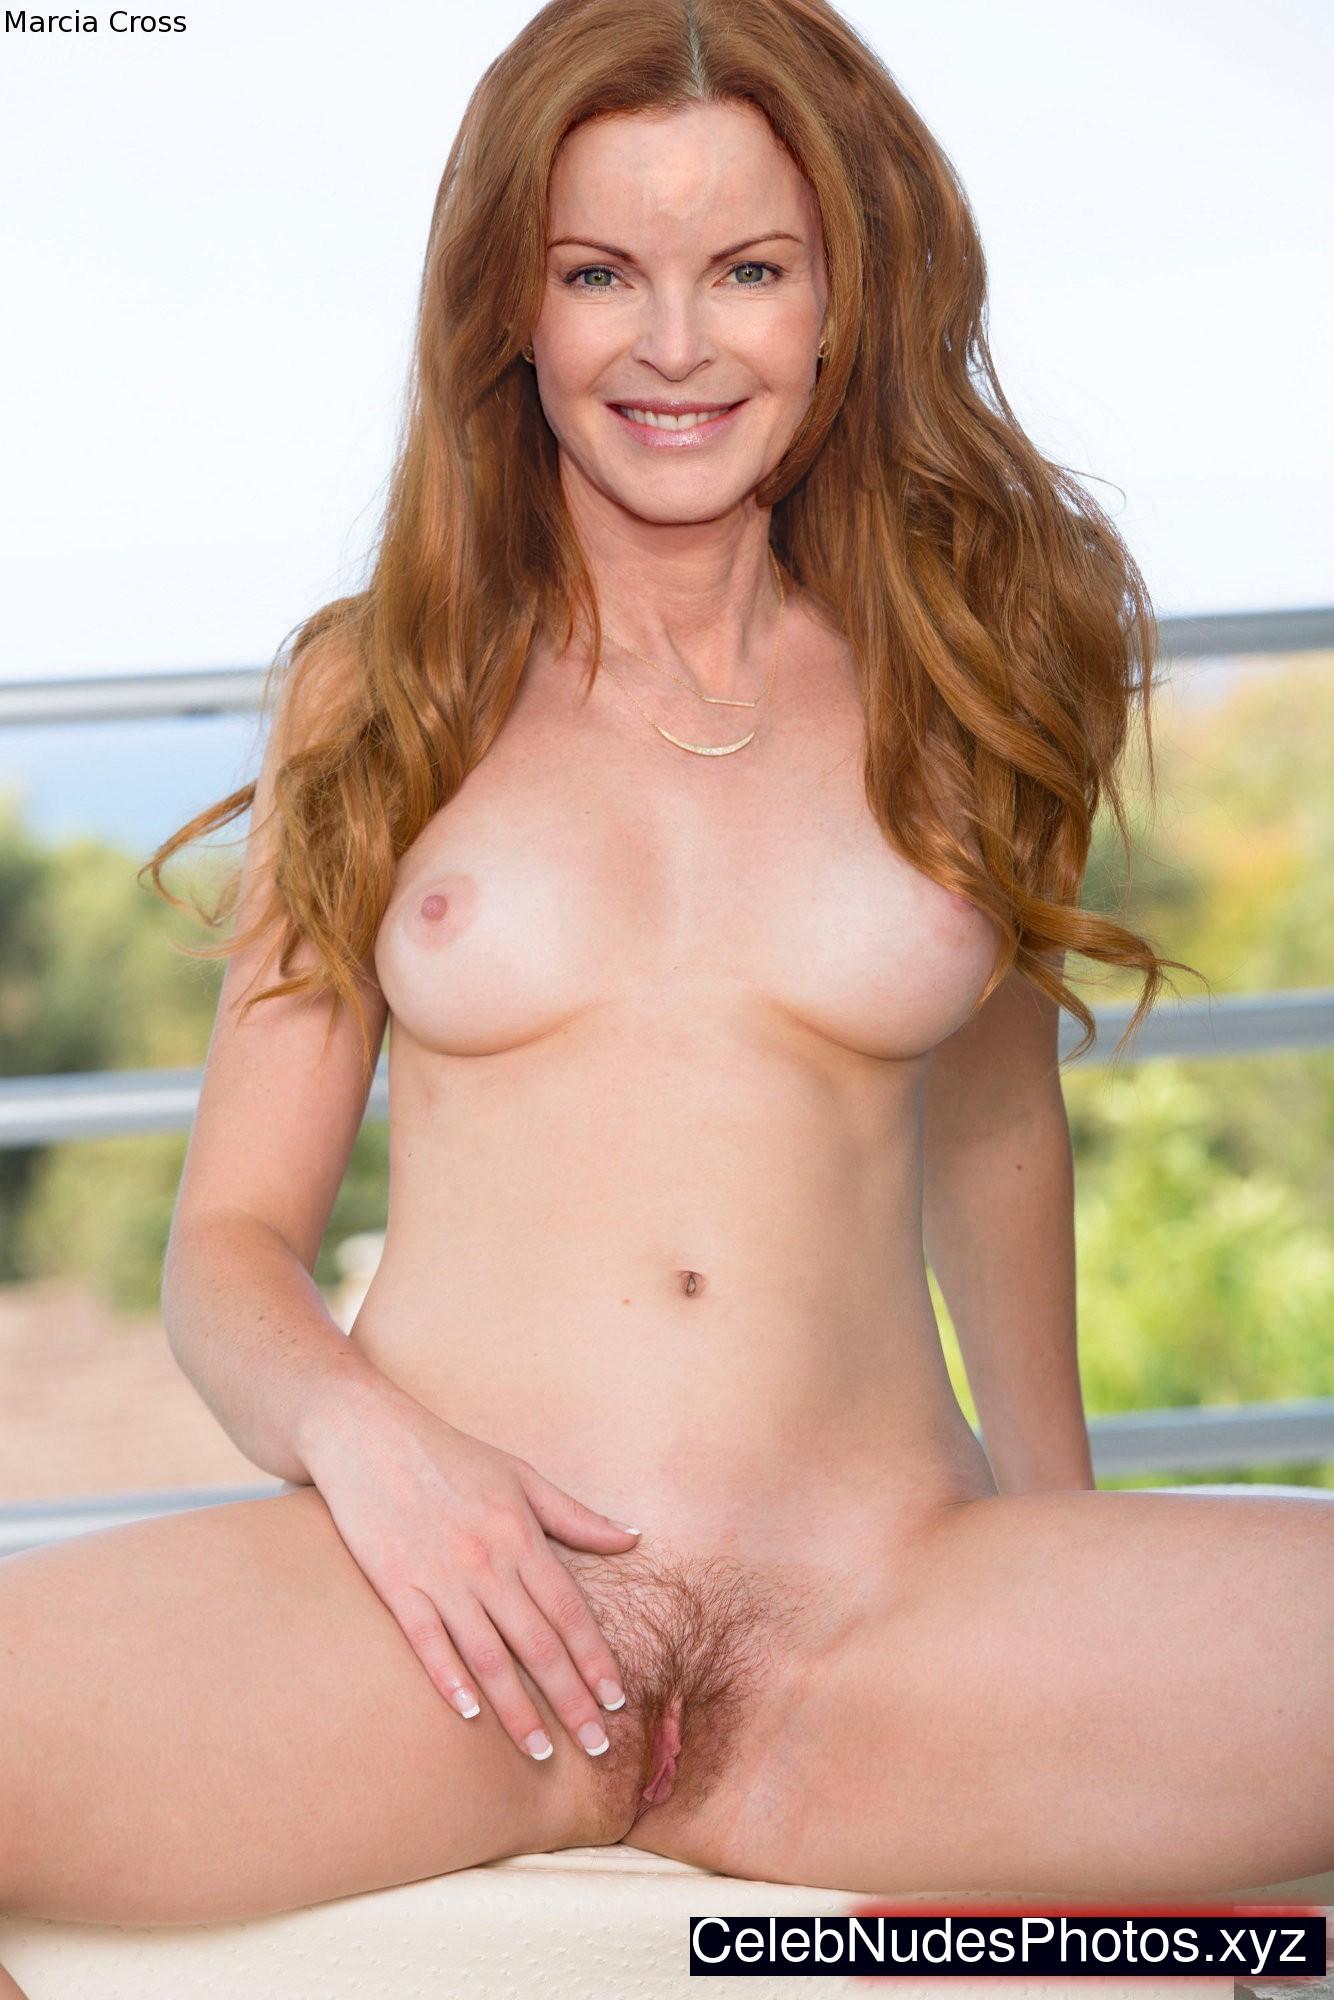 Cross porn fakes marcia nude